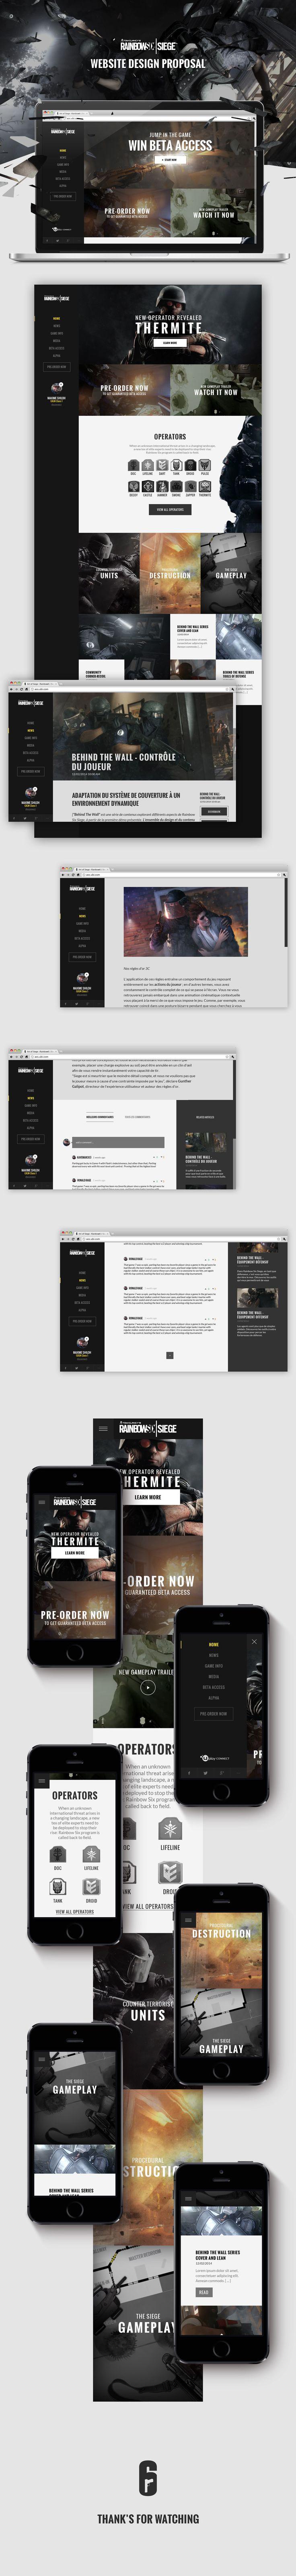 Rainbow 6 | ART OF SIEGE on #Behance #Ui #ux #mobile #layout #webdesign #case #casestudy #ubisoft